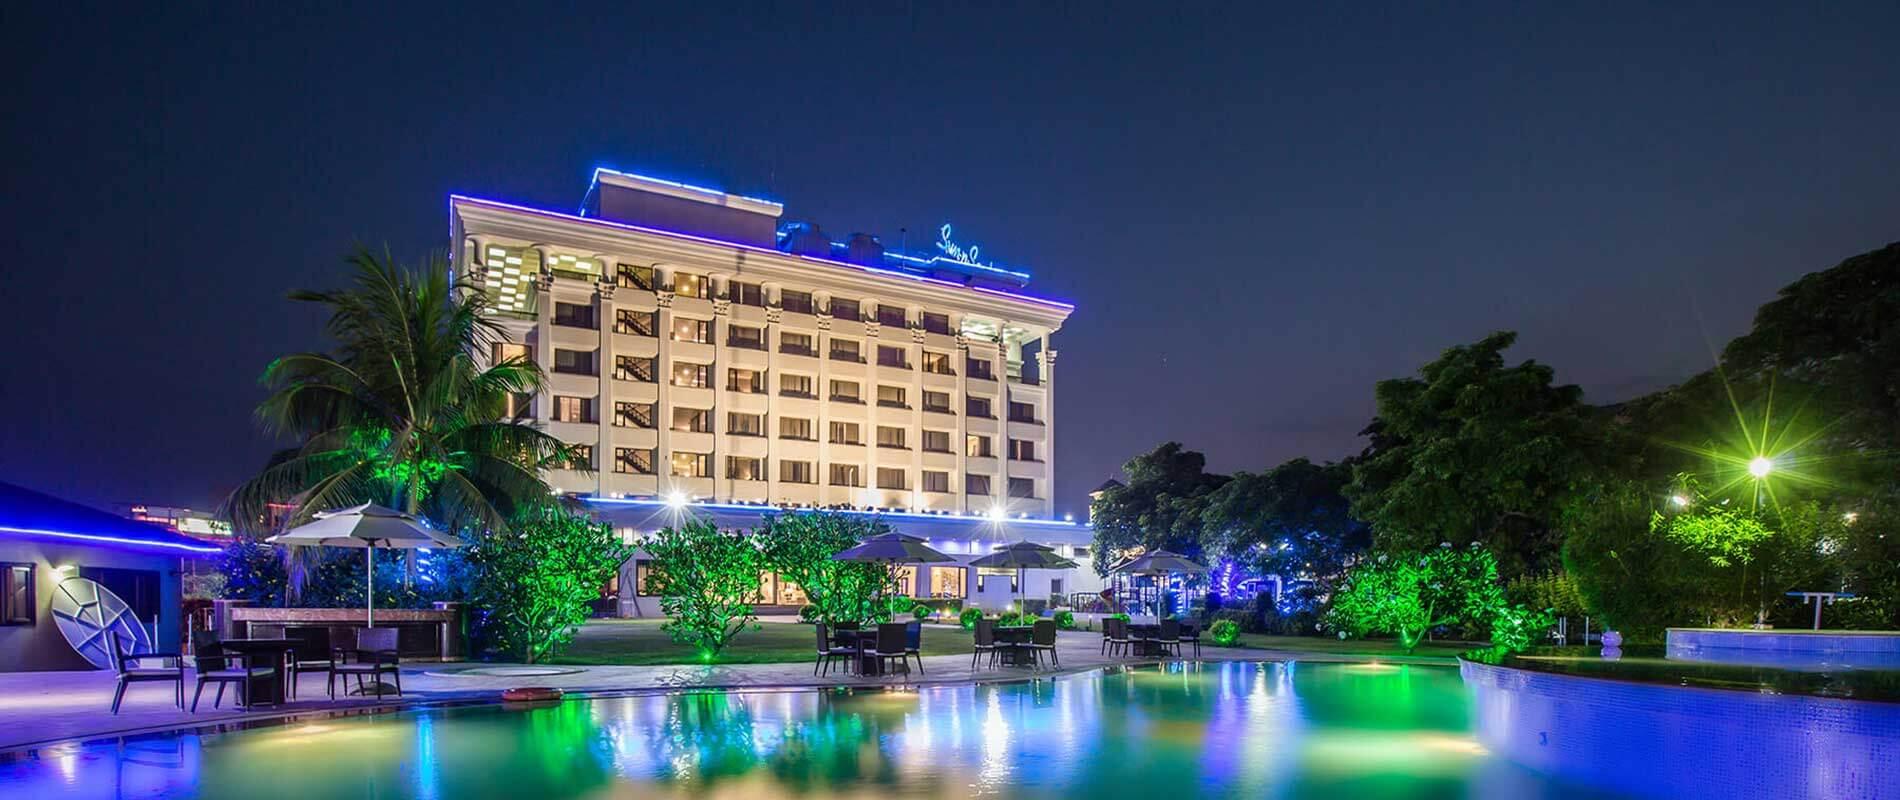 5 Star Hotels In Shirdi Near Temple Best Shirdi Accommodation